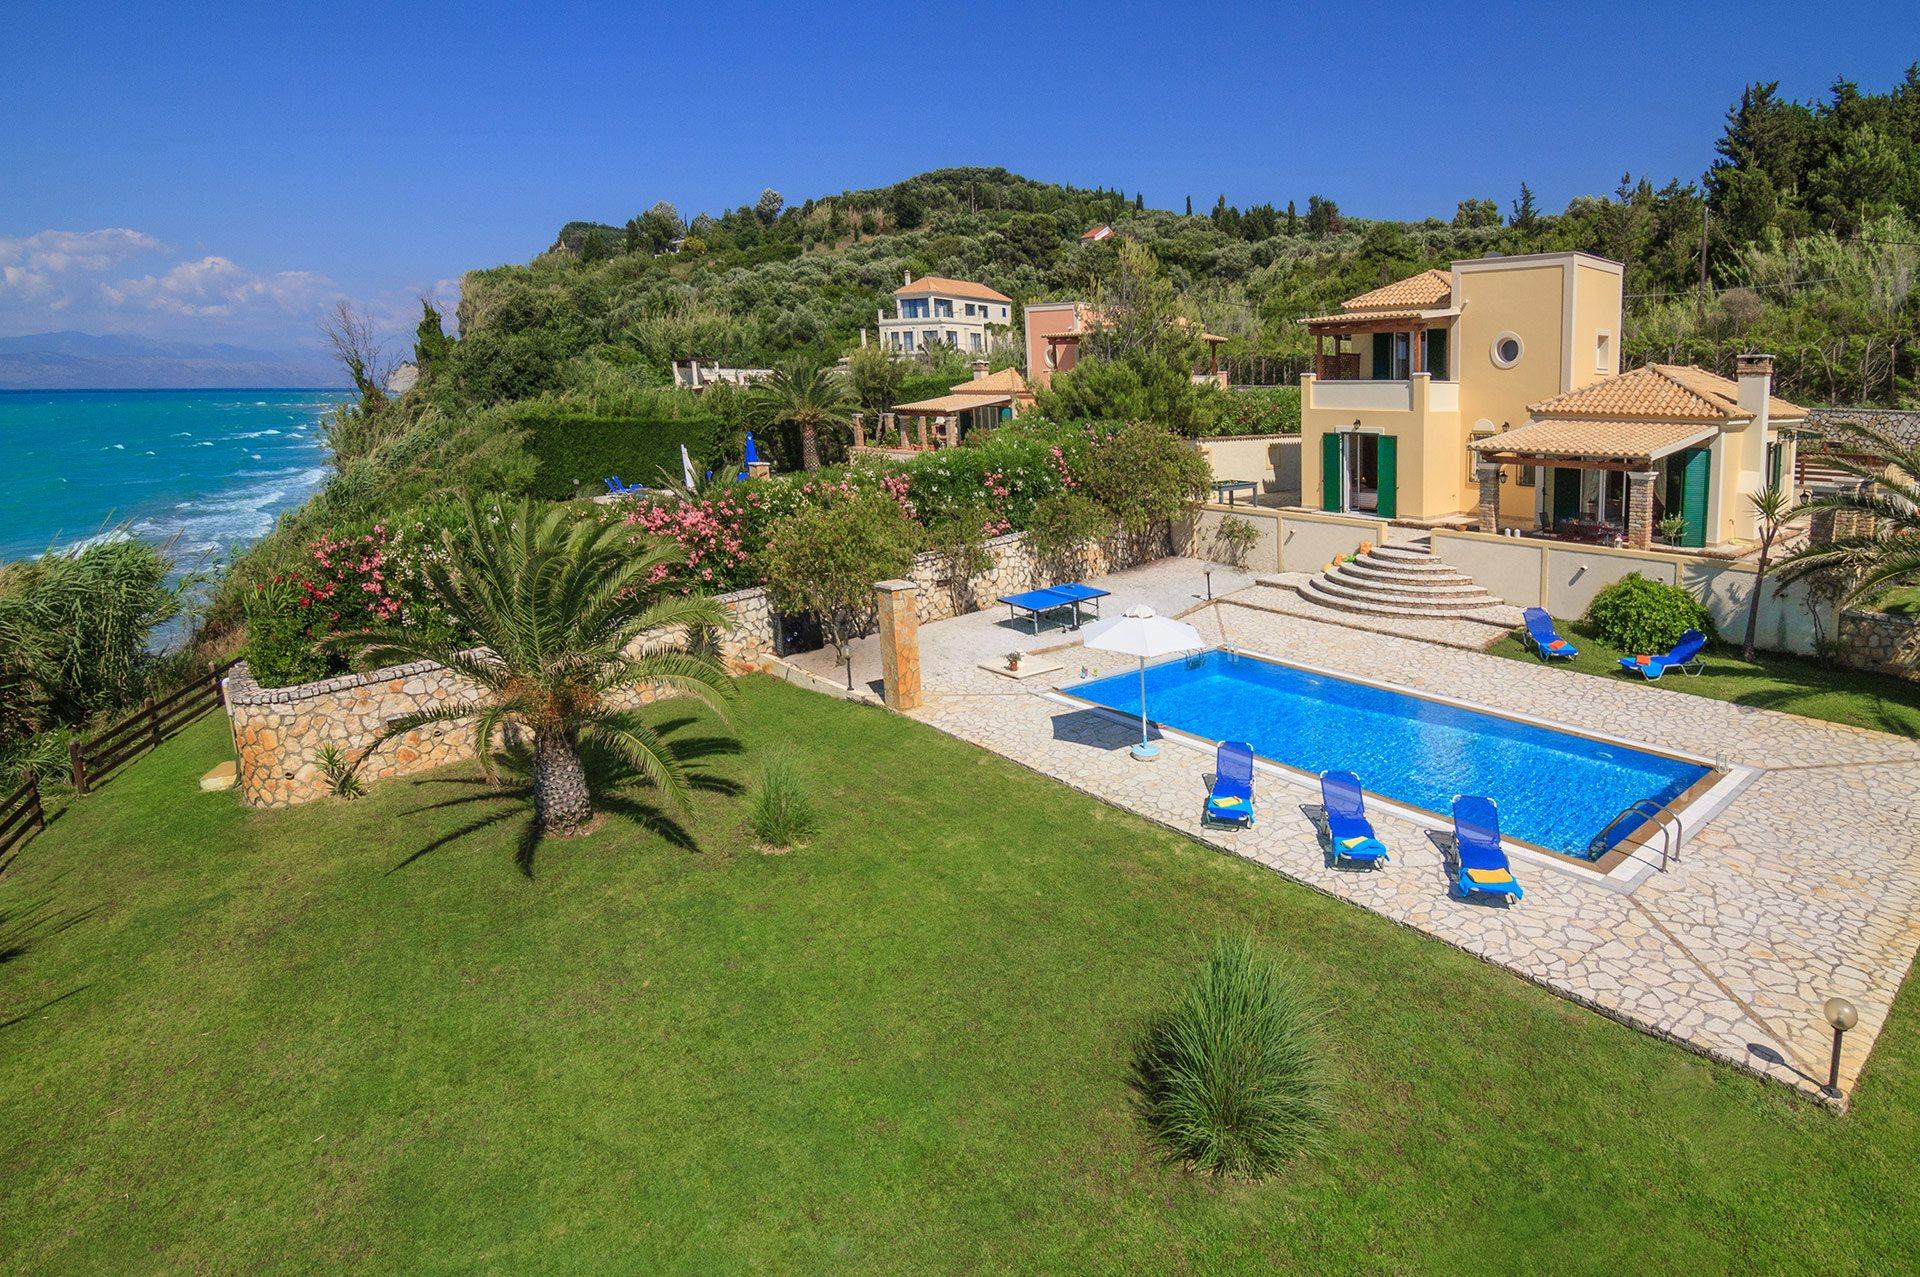 Villa Victoras, Sidari, Corfu, Greece